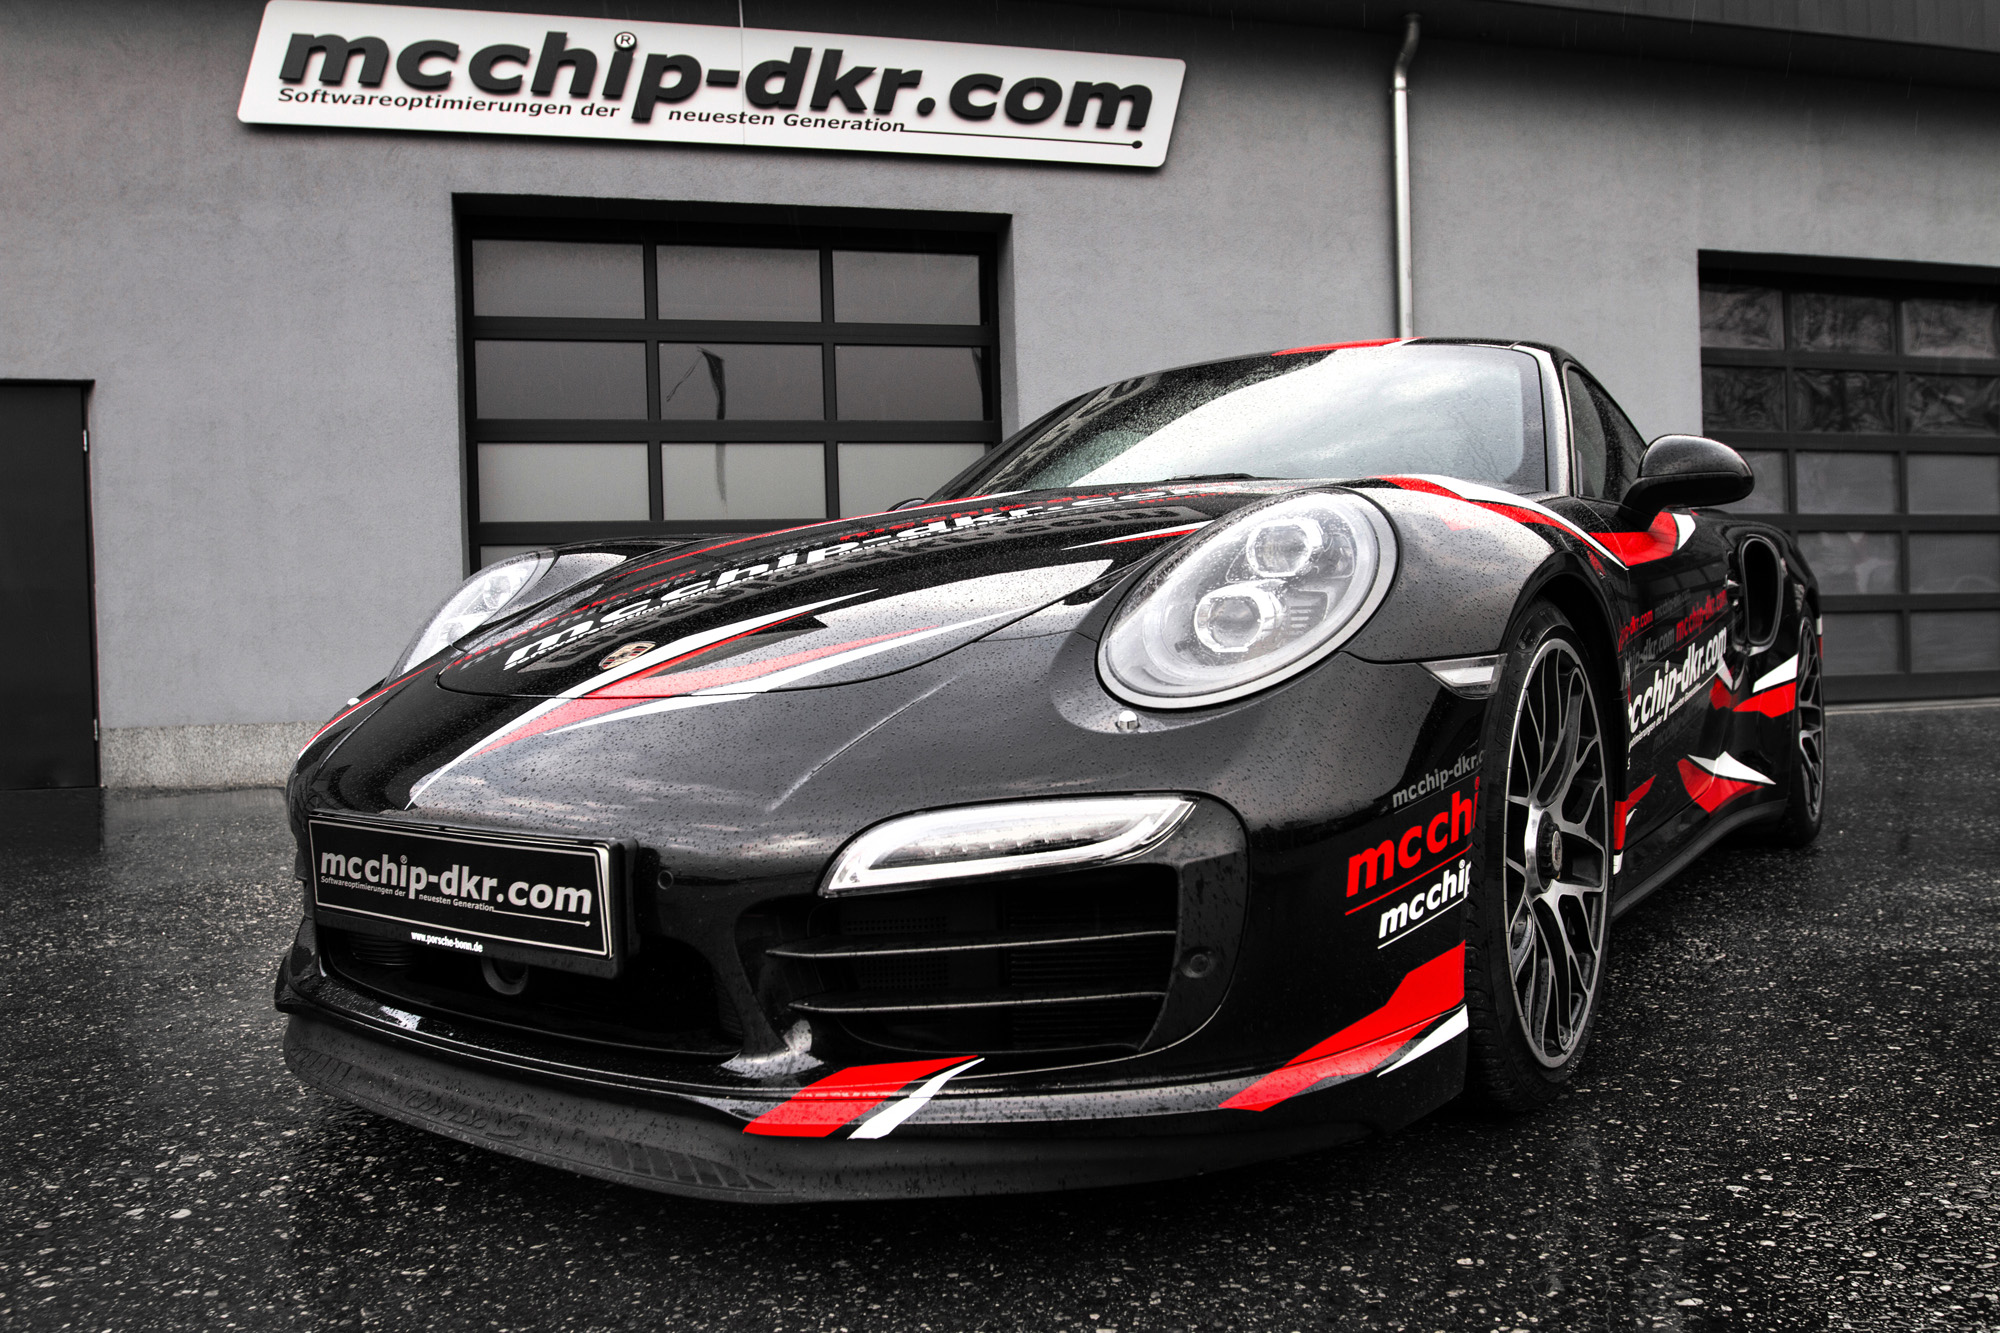 porsche-911-turbo-s-991-mcchip-dkr-05